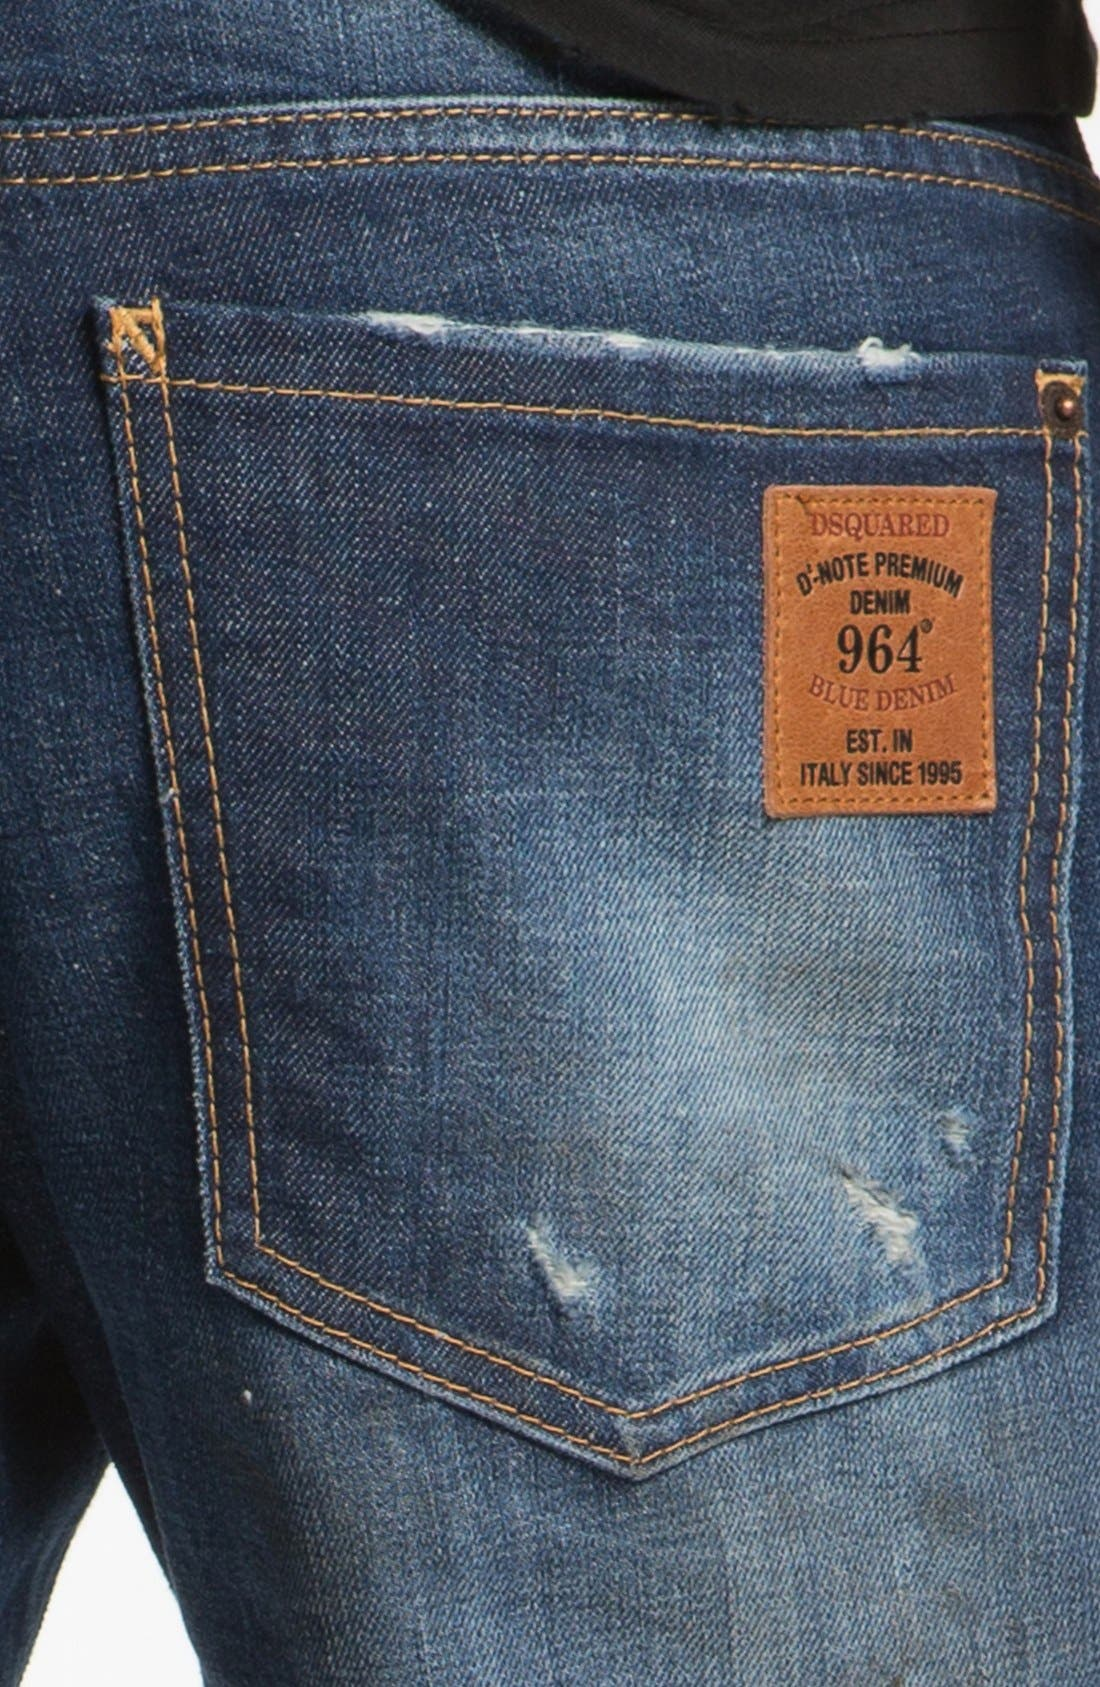 Alternate Image 4  - Dsquared2 'Dean' Narrow Straight Leg Jeans (Blue)